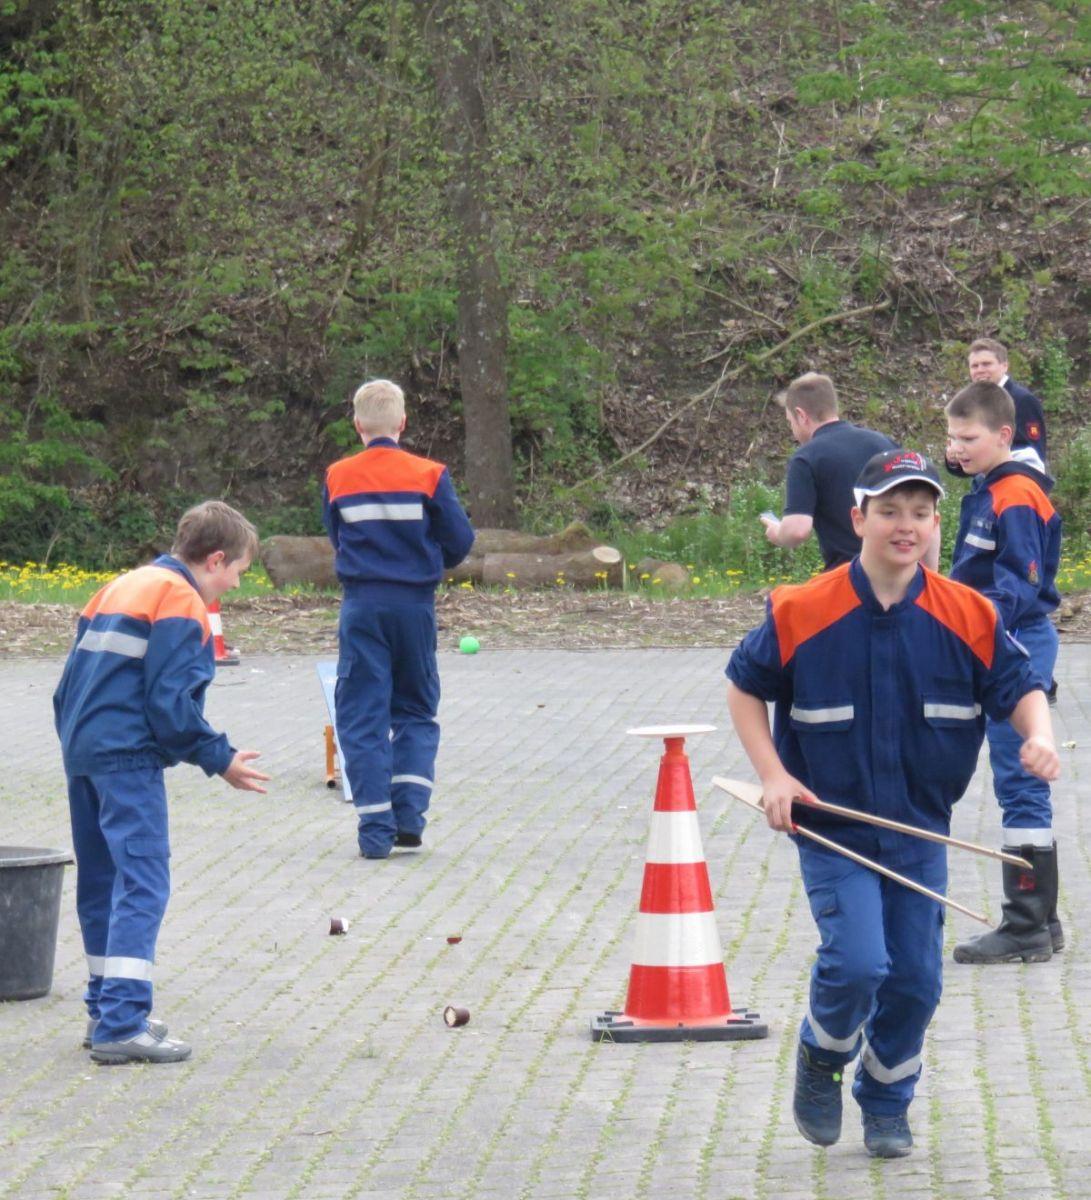 jf_eversberg-wehrstapel/2017-05-13-KFWT124.jpg